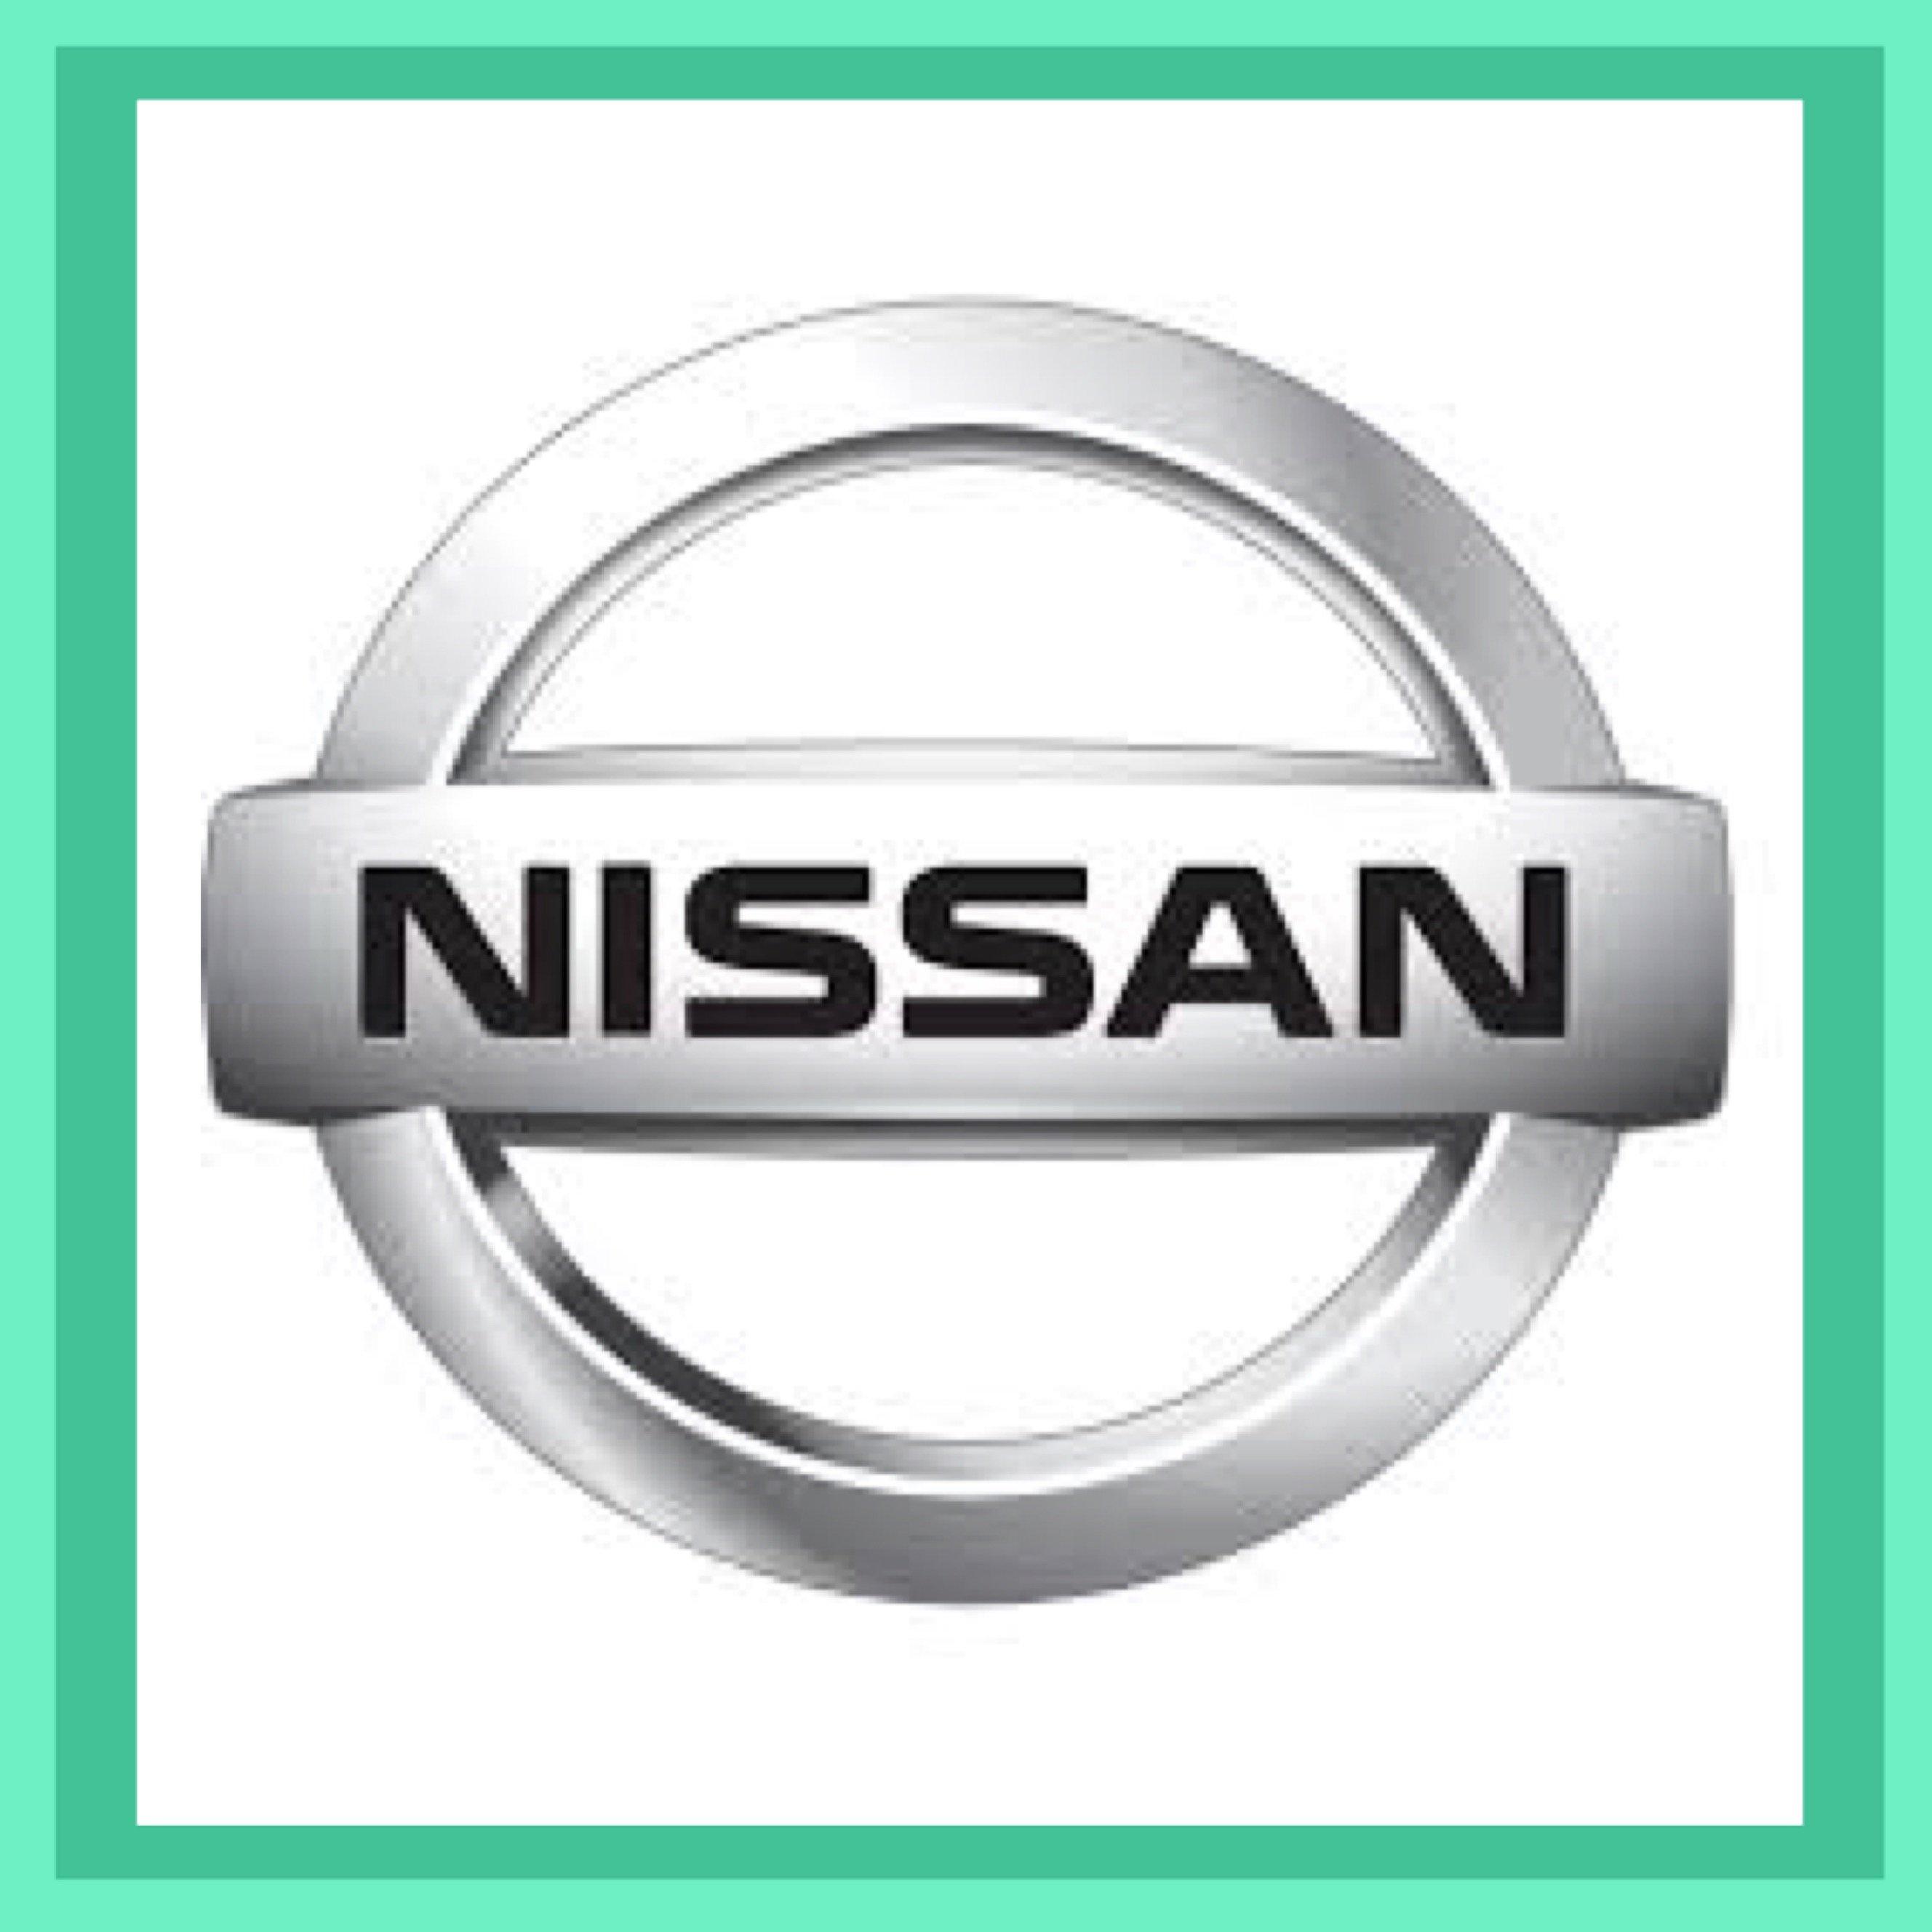 NISSAN X-TRAIL KEYLESS ENTRY REMOTE